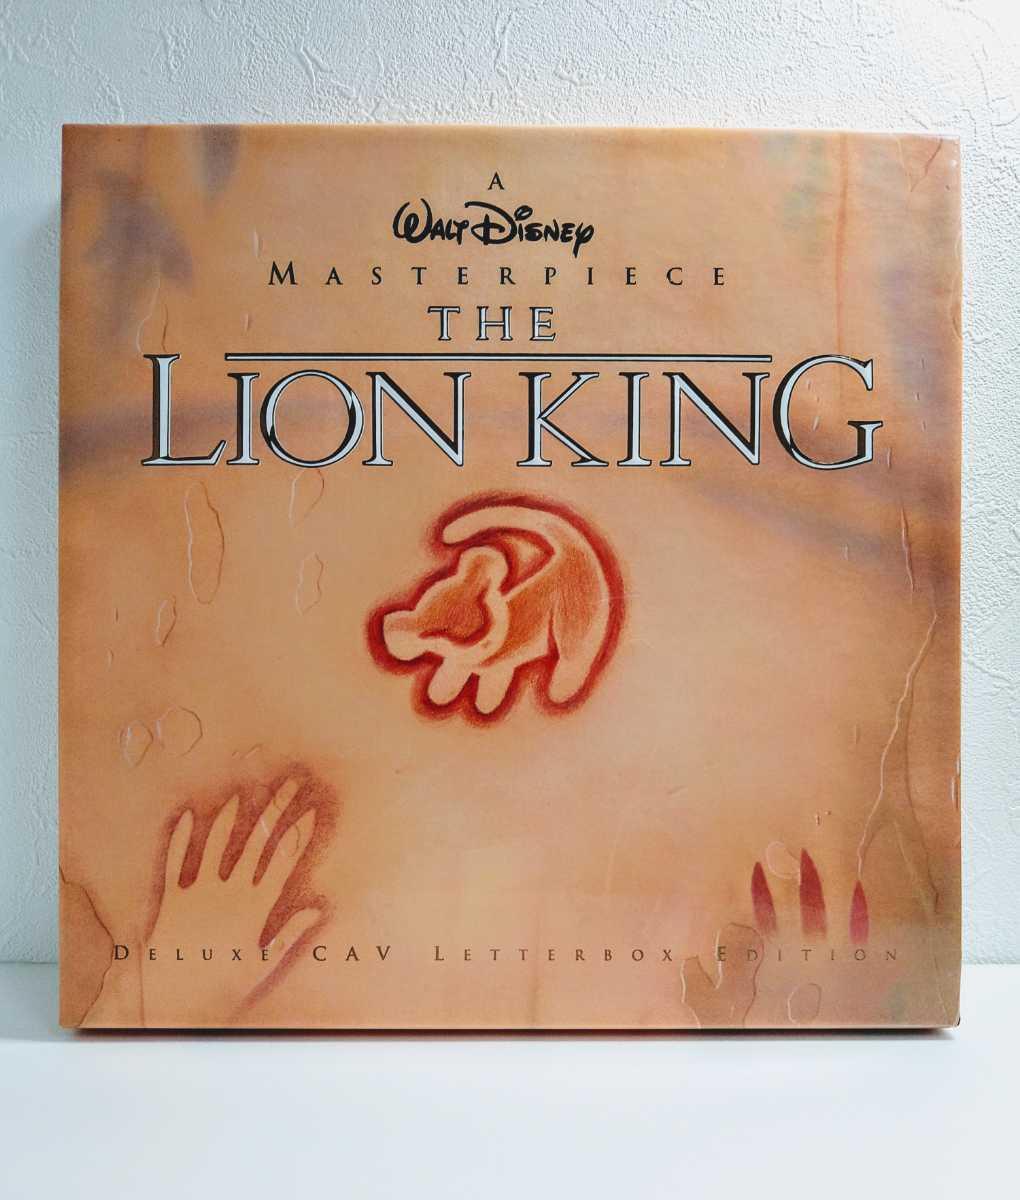 LD BOX 輸入盤 美品 ライオンキング LION KING イラスト画 Disney USA レーザーディスク _画像1